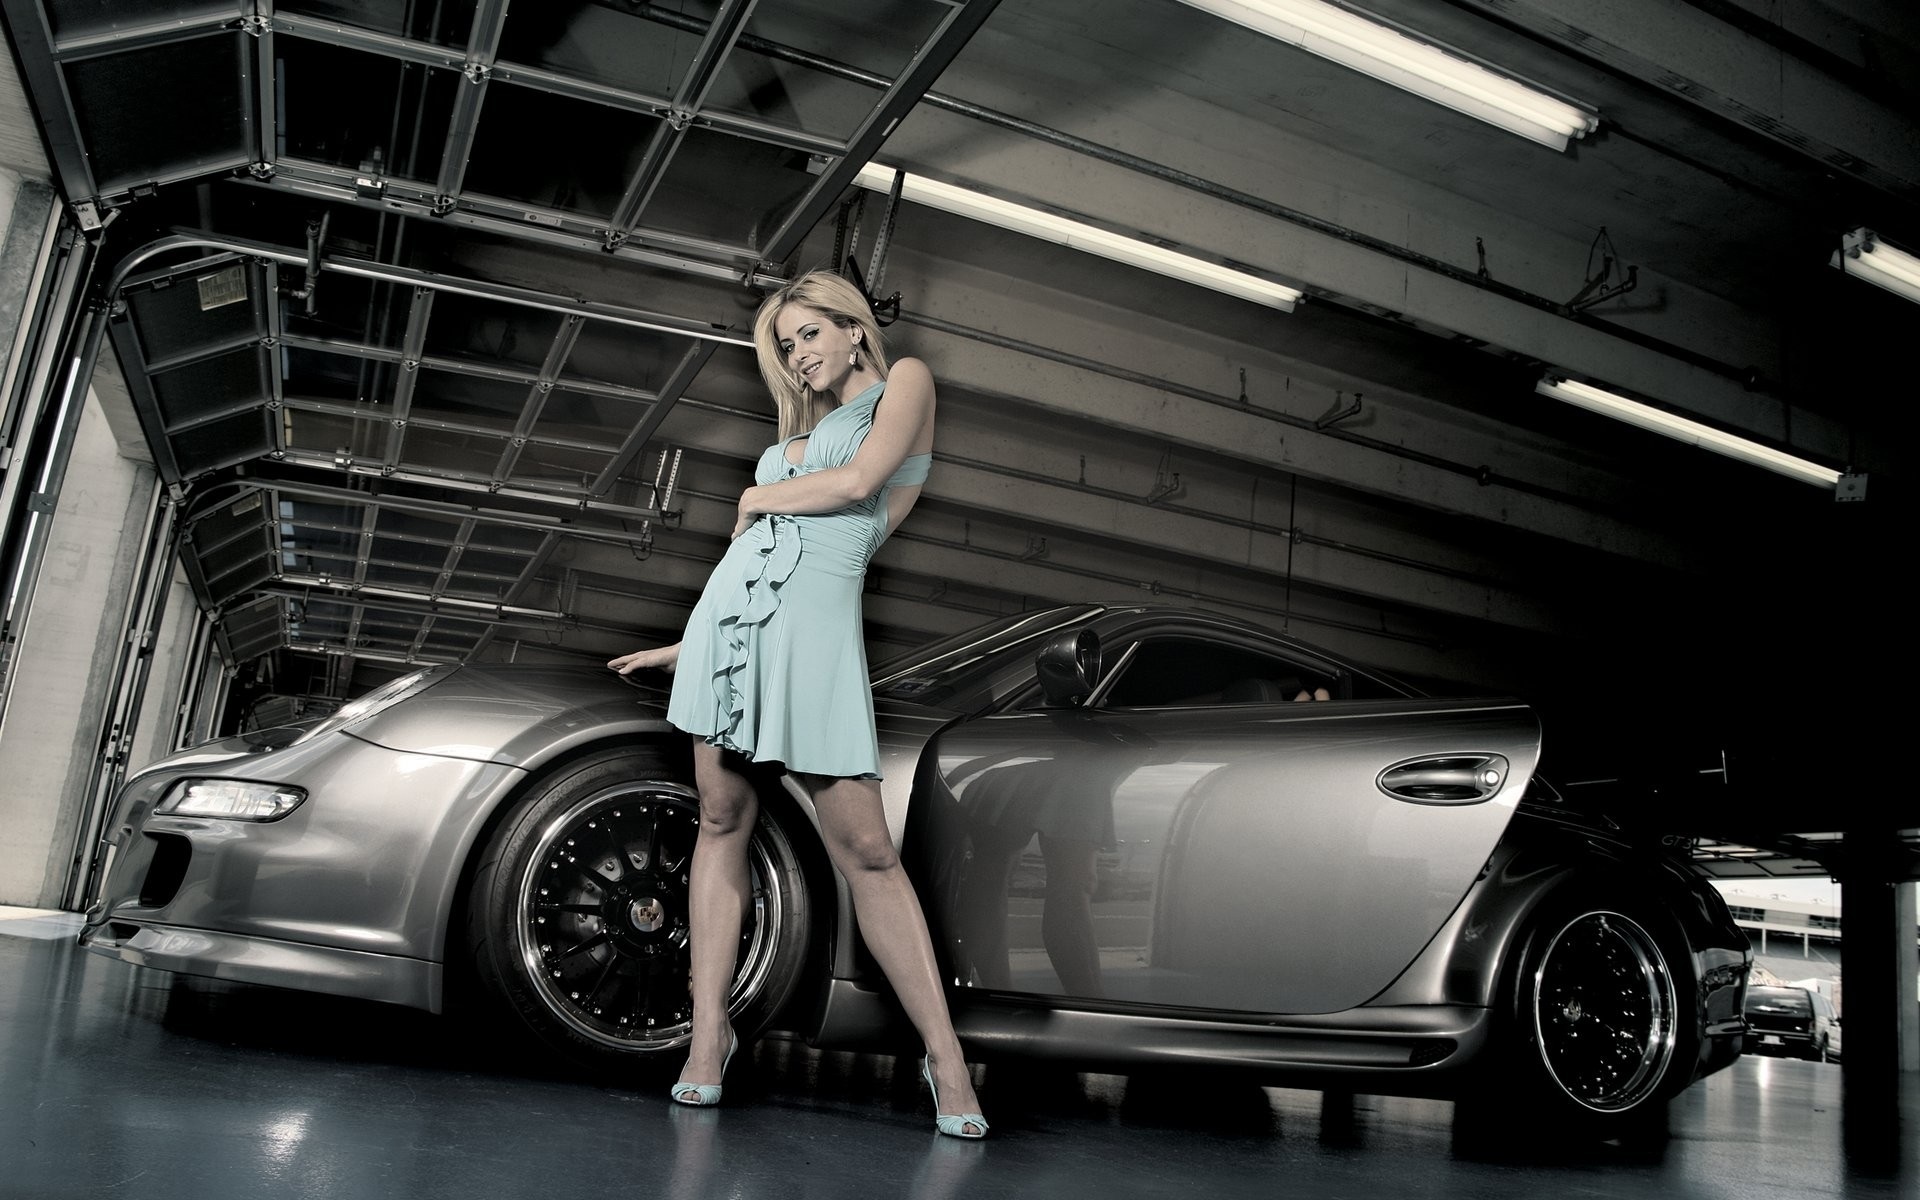 Girls_Beautyful_Girls_Beautiful_girl_and_car_022846_.jpg